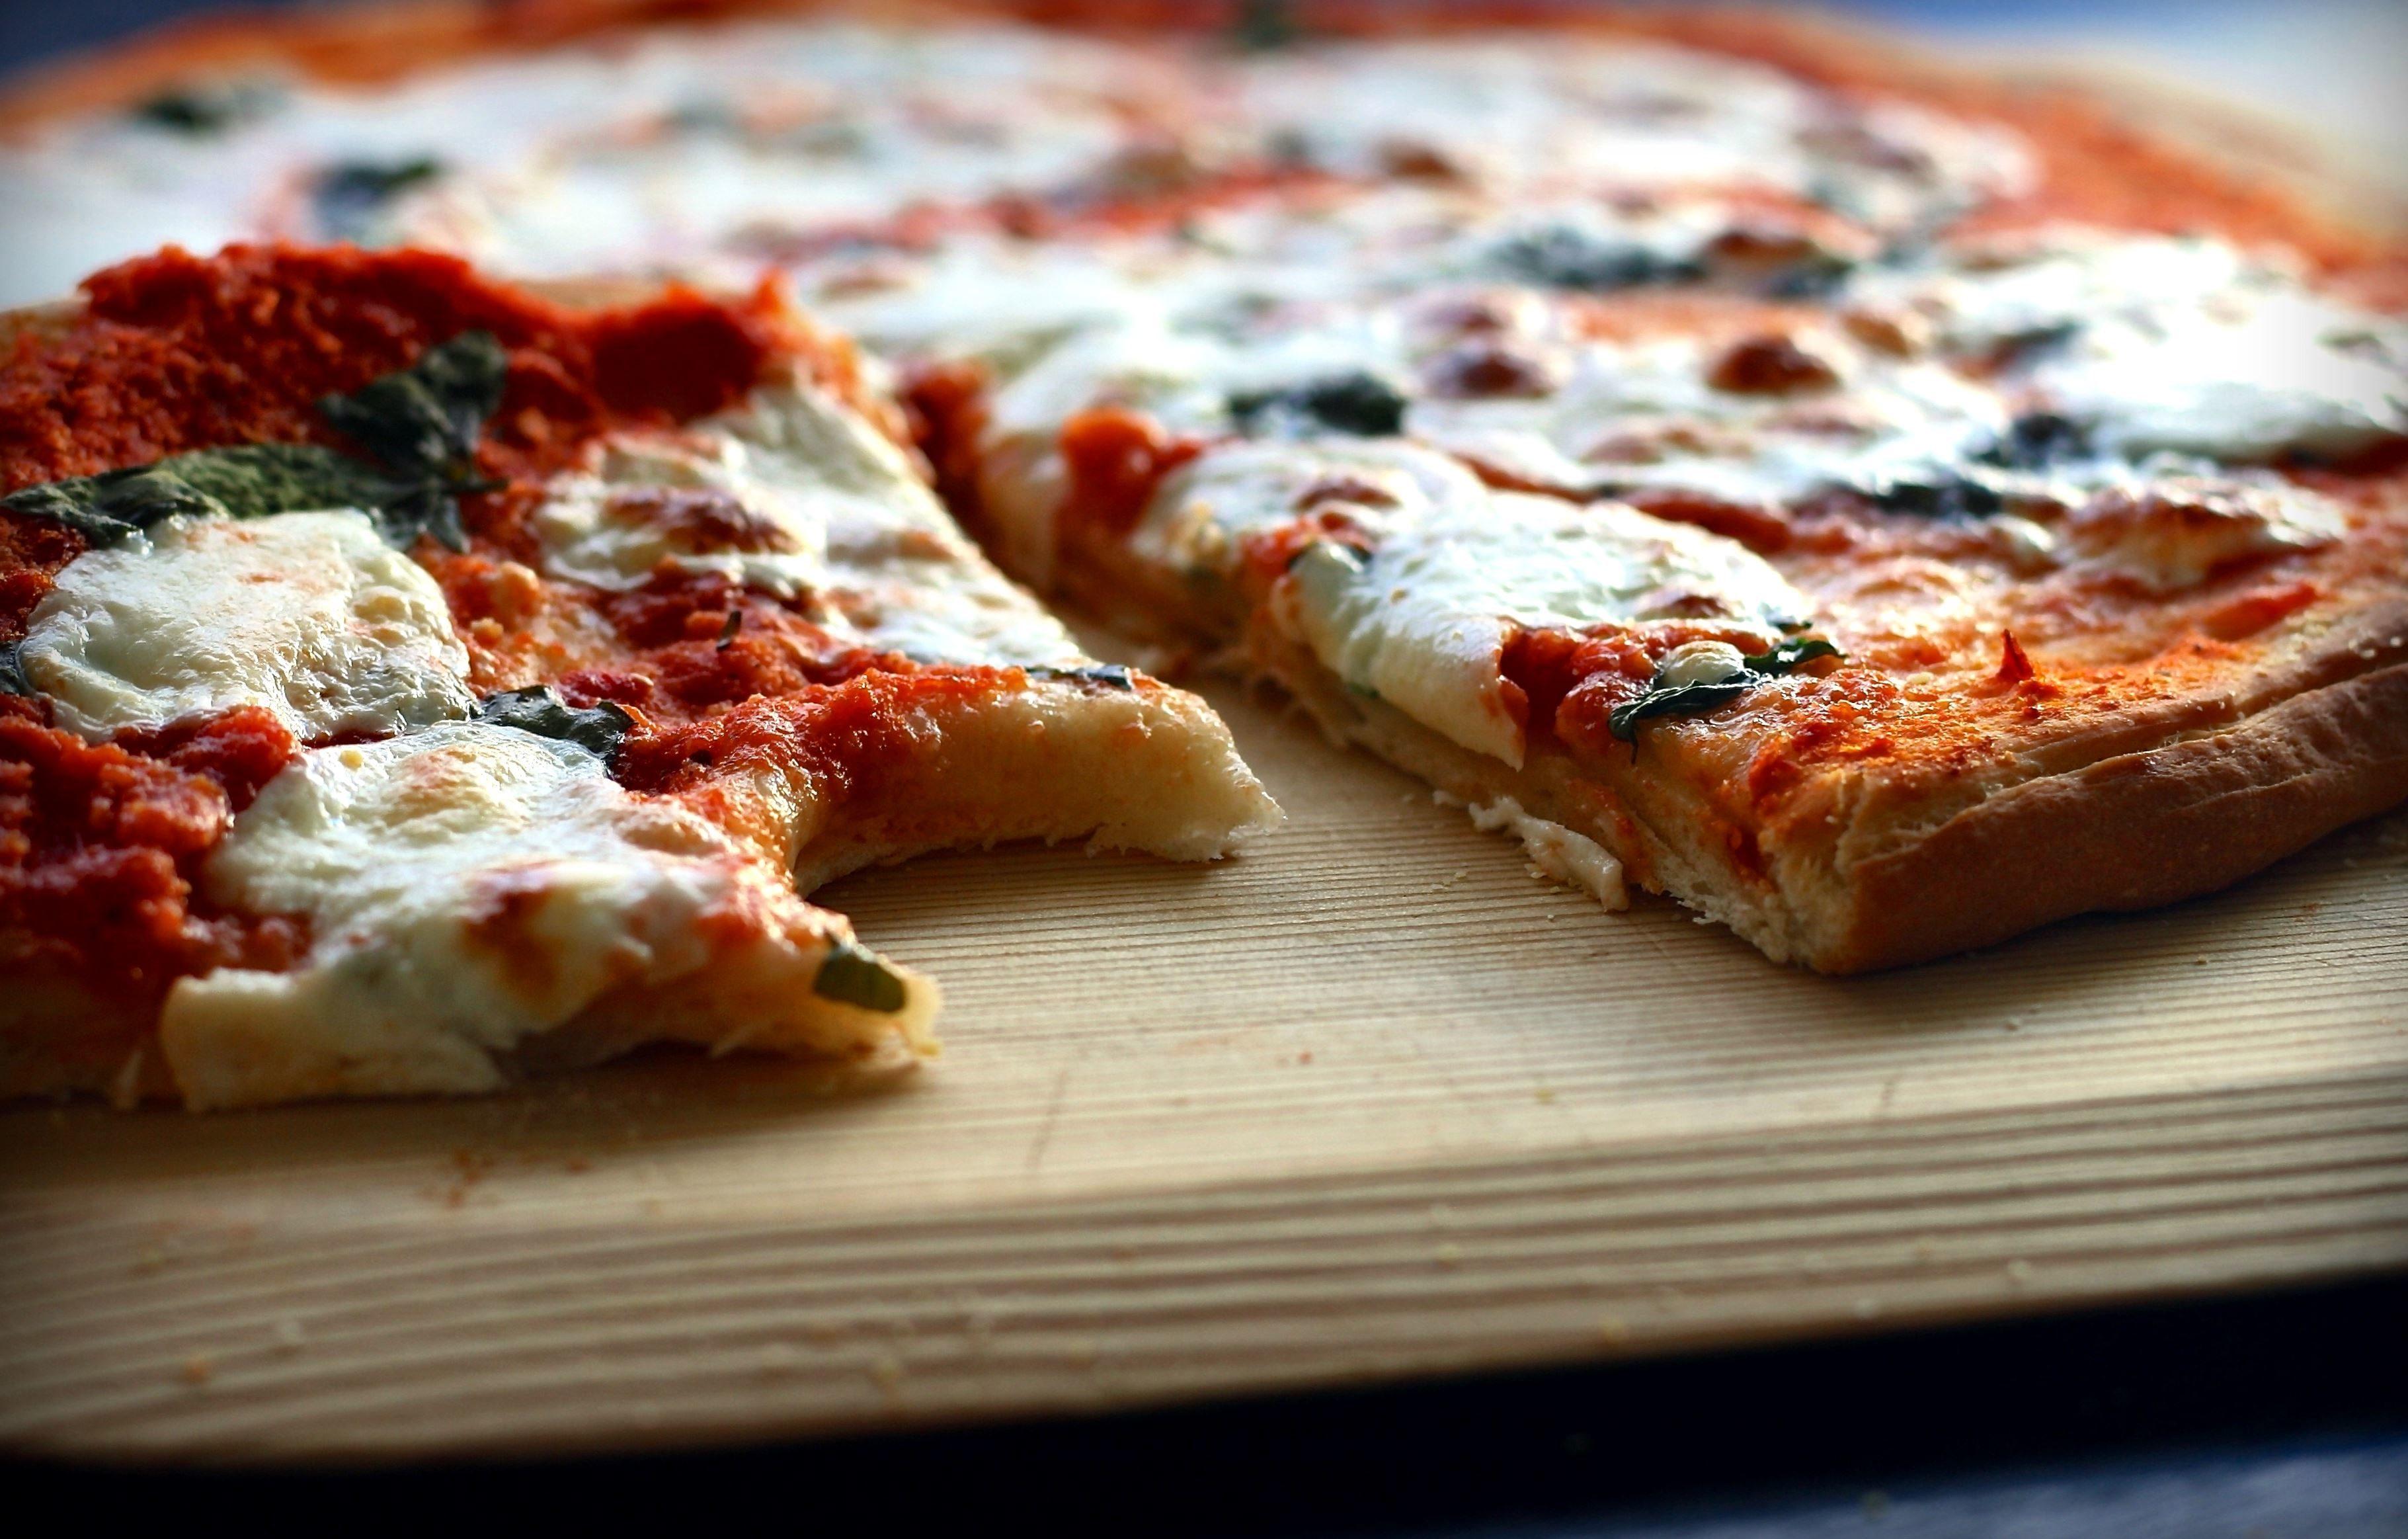 Image Libre Plat Pizza Nourriture Dîner Tomates